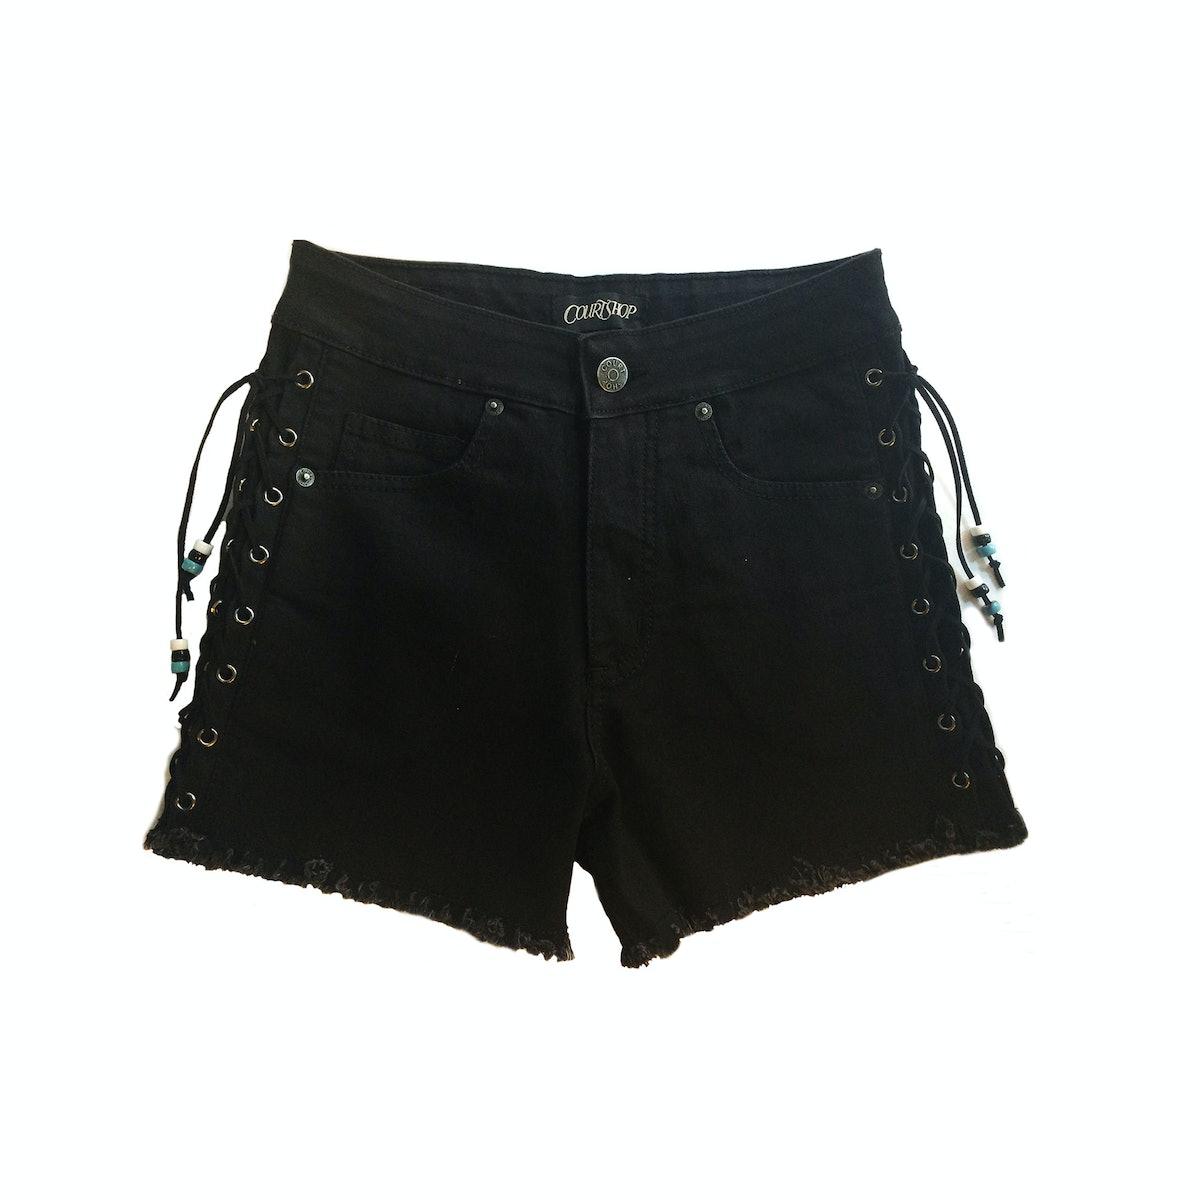 Courtshop shorts